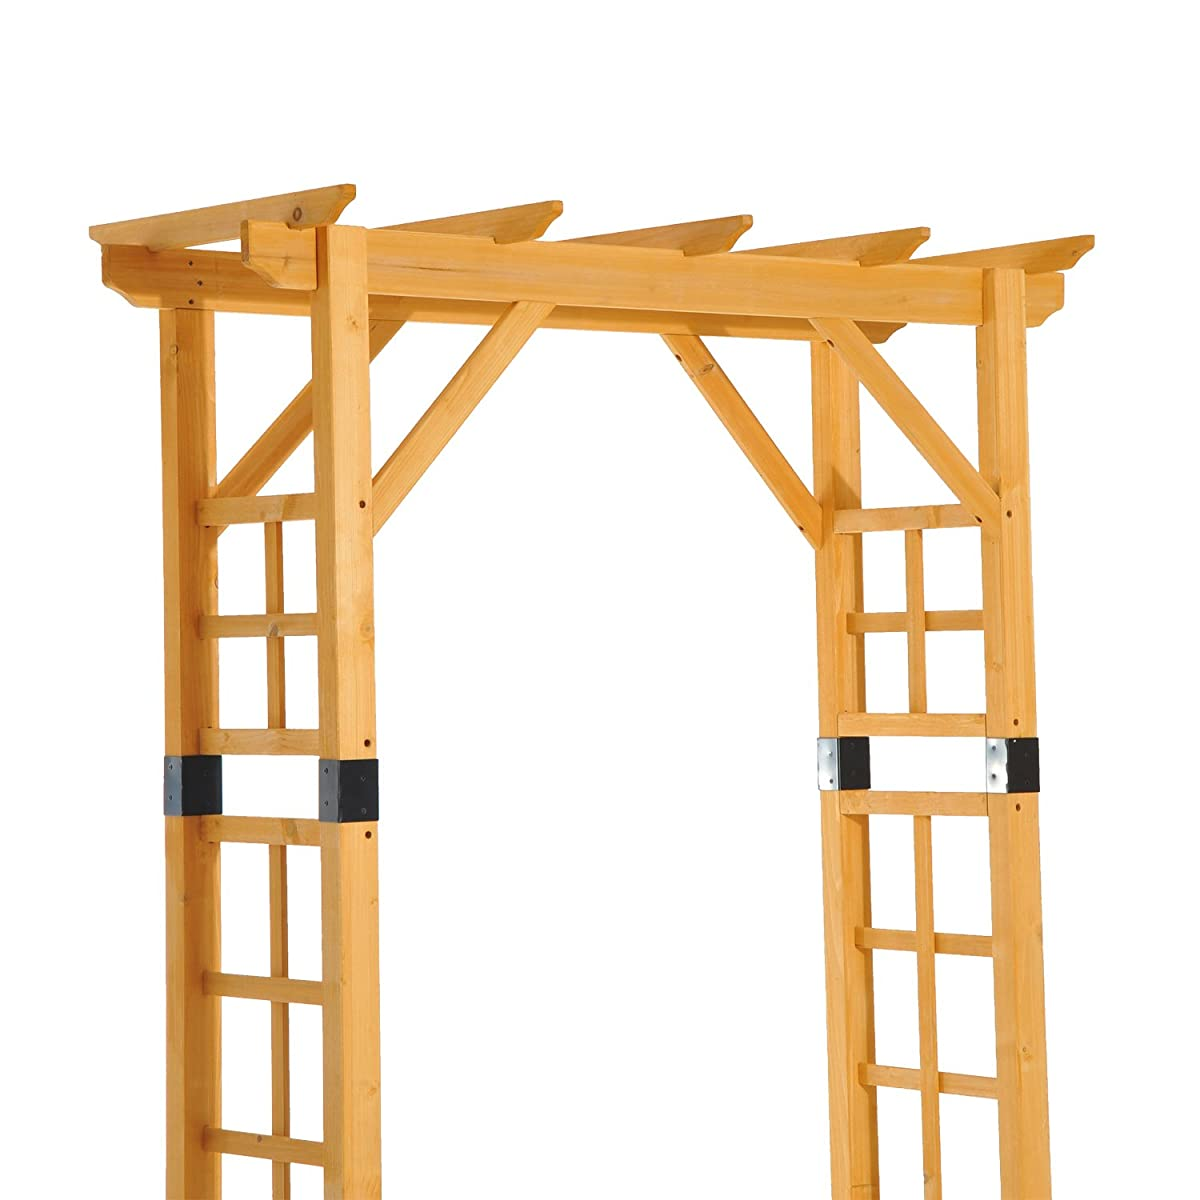 "Outsunny 84"" Wooden Garden Arbor Arch Trellis (Squared)"